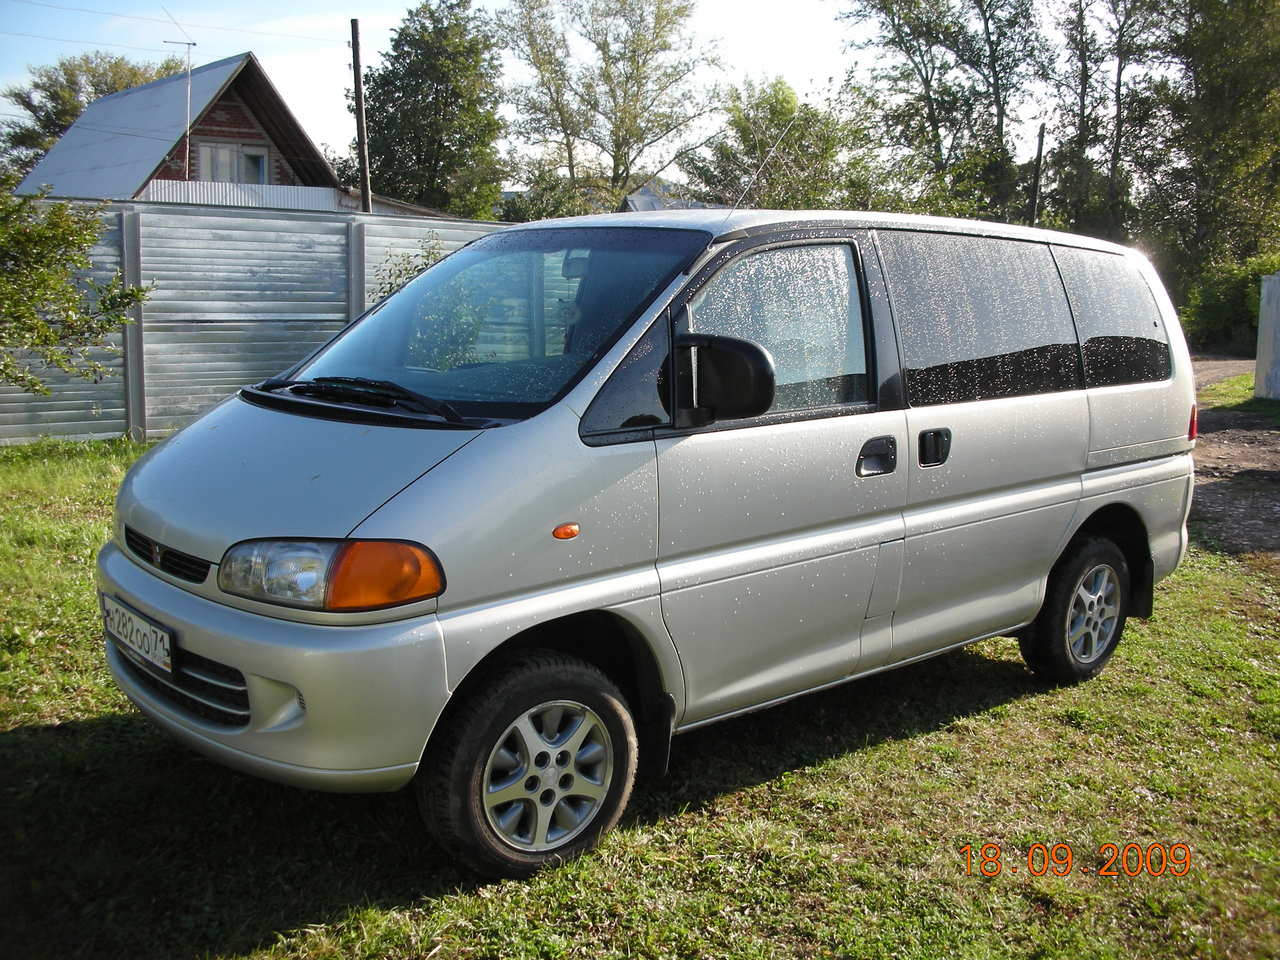 Used 1996 Mitsubishi Space Gear Photos 1997cc Gasoline